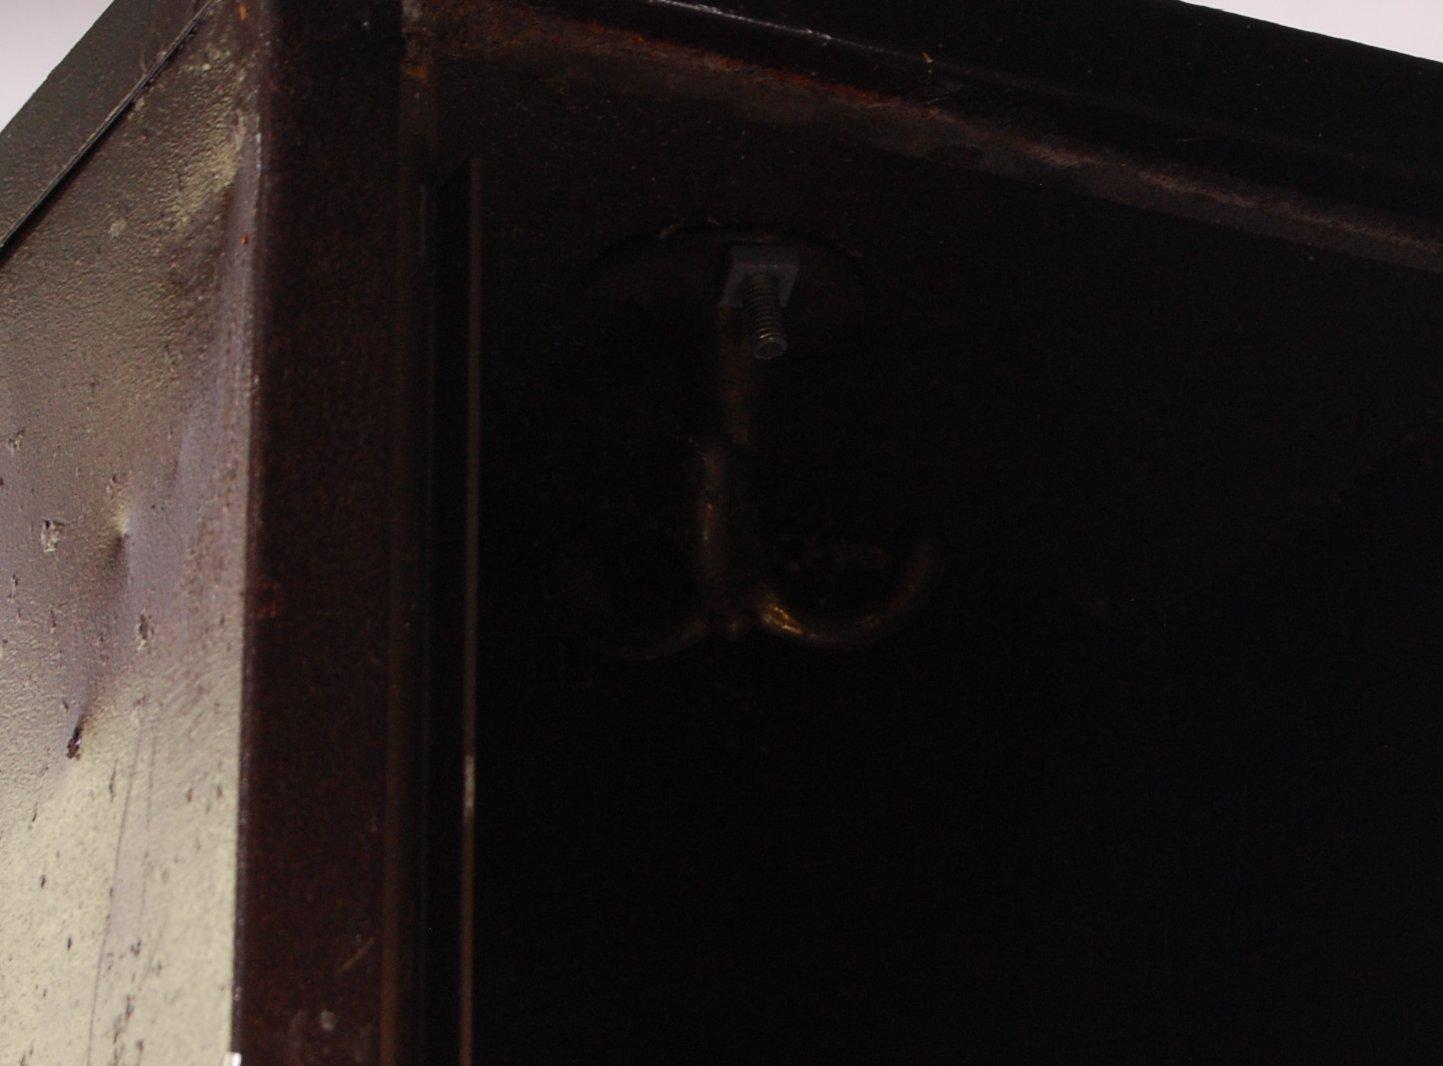 Lot 192 - 20TH CENTURY METAL SHOTGUN / FIREARMS CABINET WITH KEYS